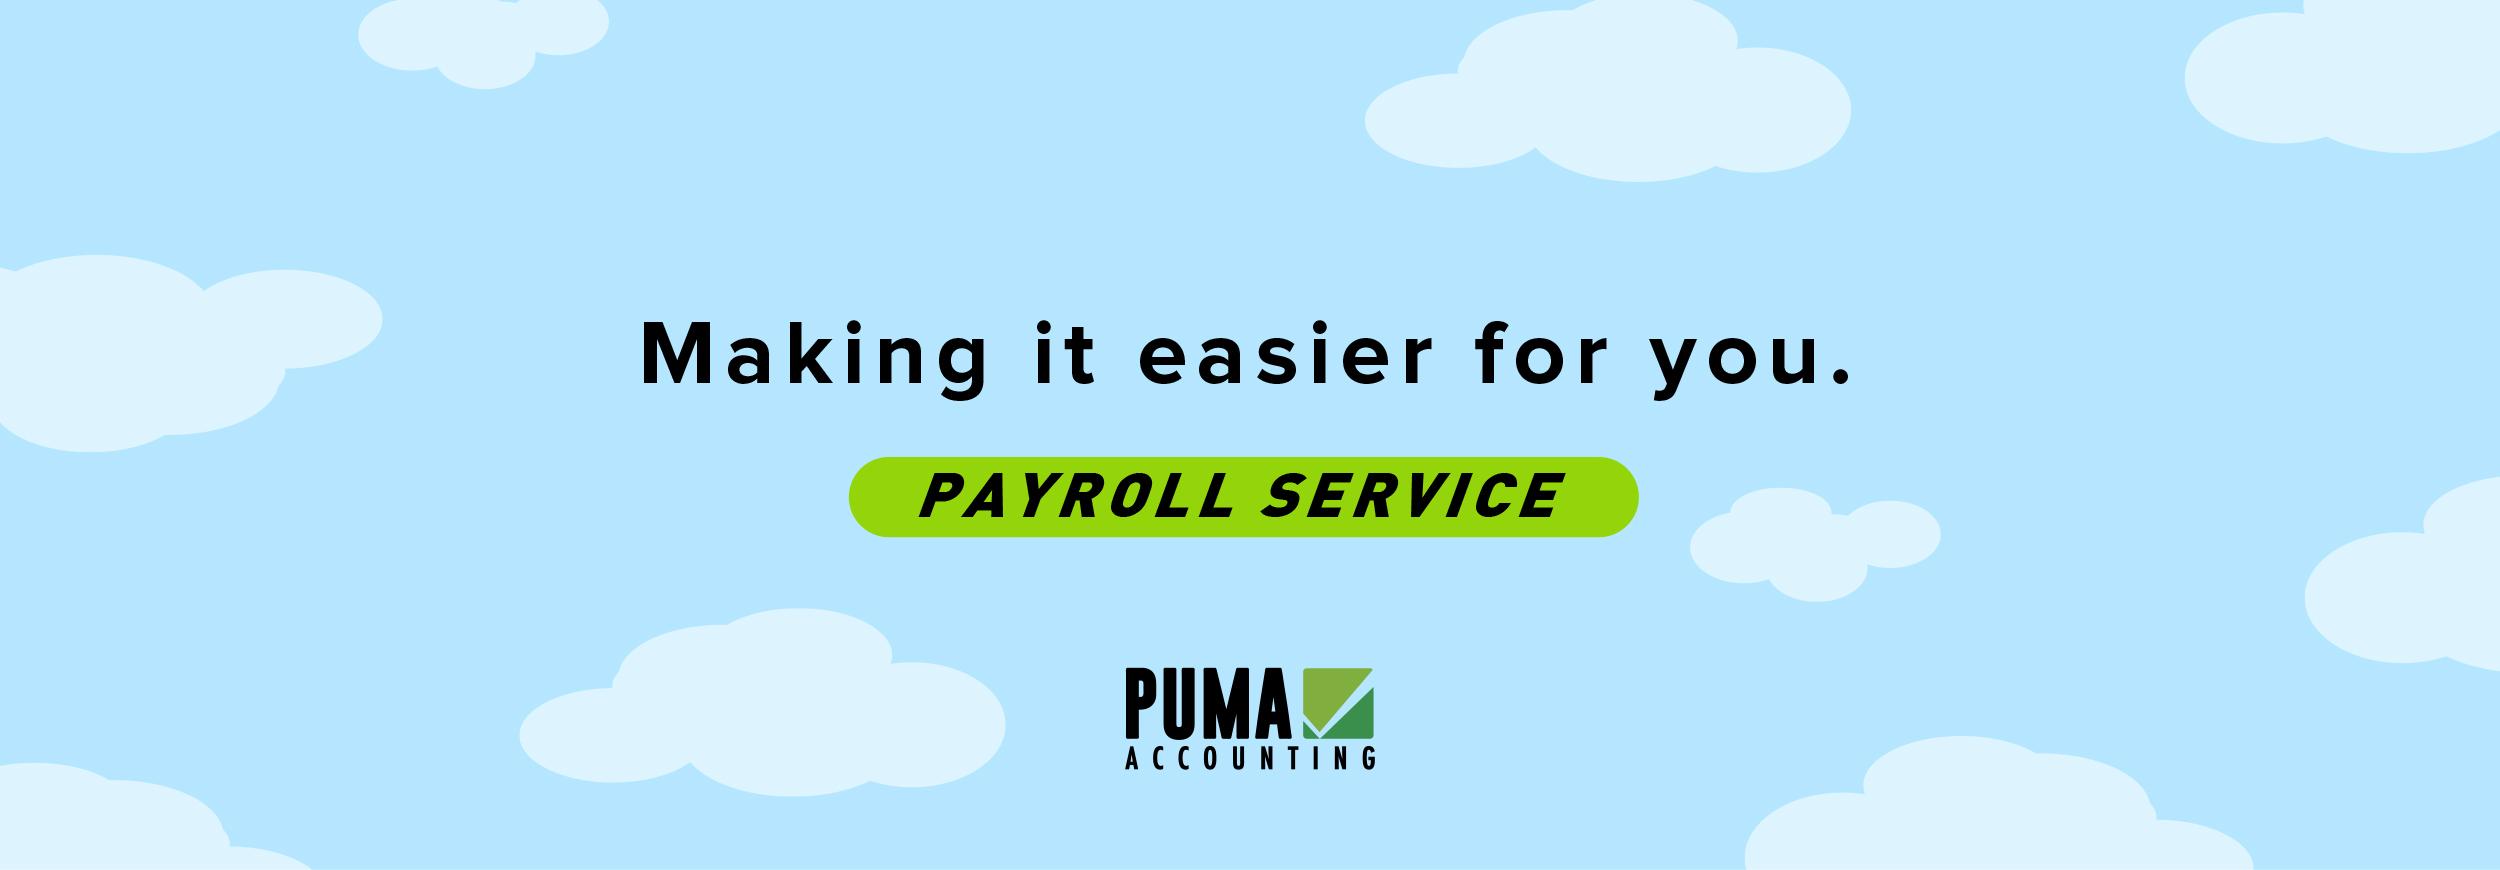 Puma_Accounting_Payroll_service_making_easy_01.jpg